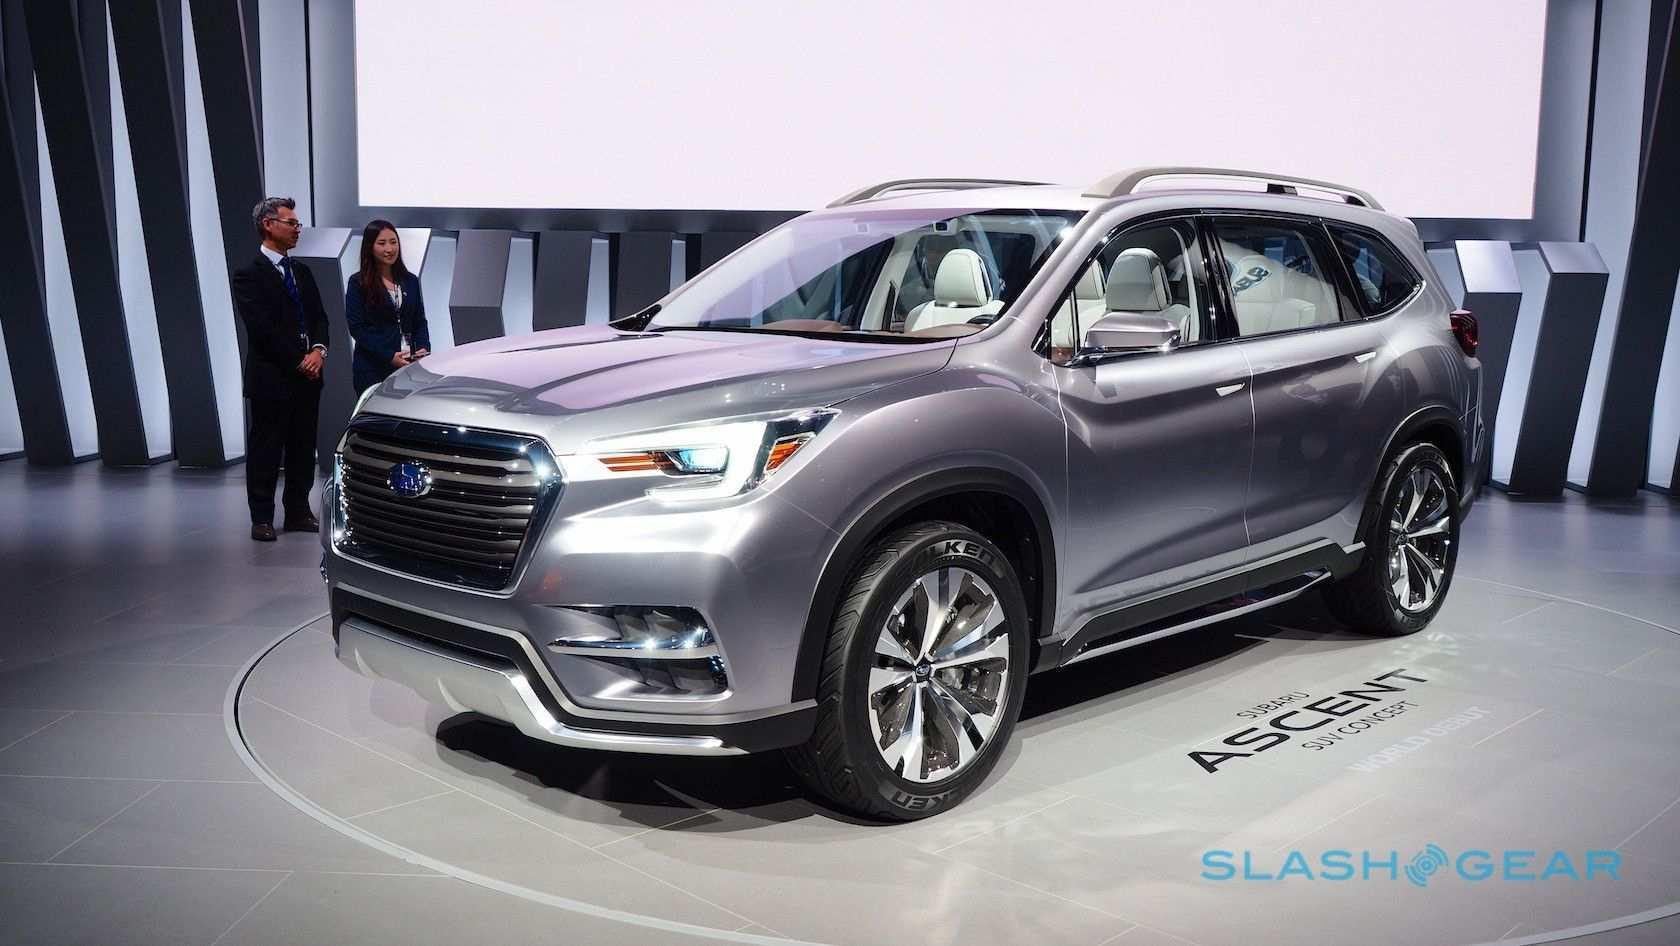 49 Best Review 2020 Subaru Ascent Dimensions Exterior by 2020 Subaru Ascent Dimensions